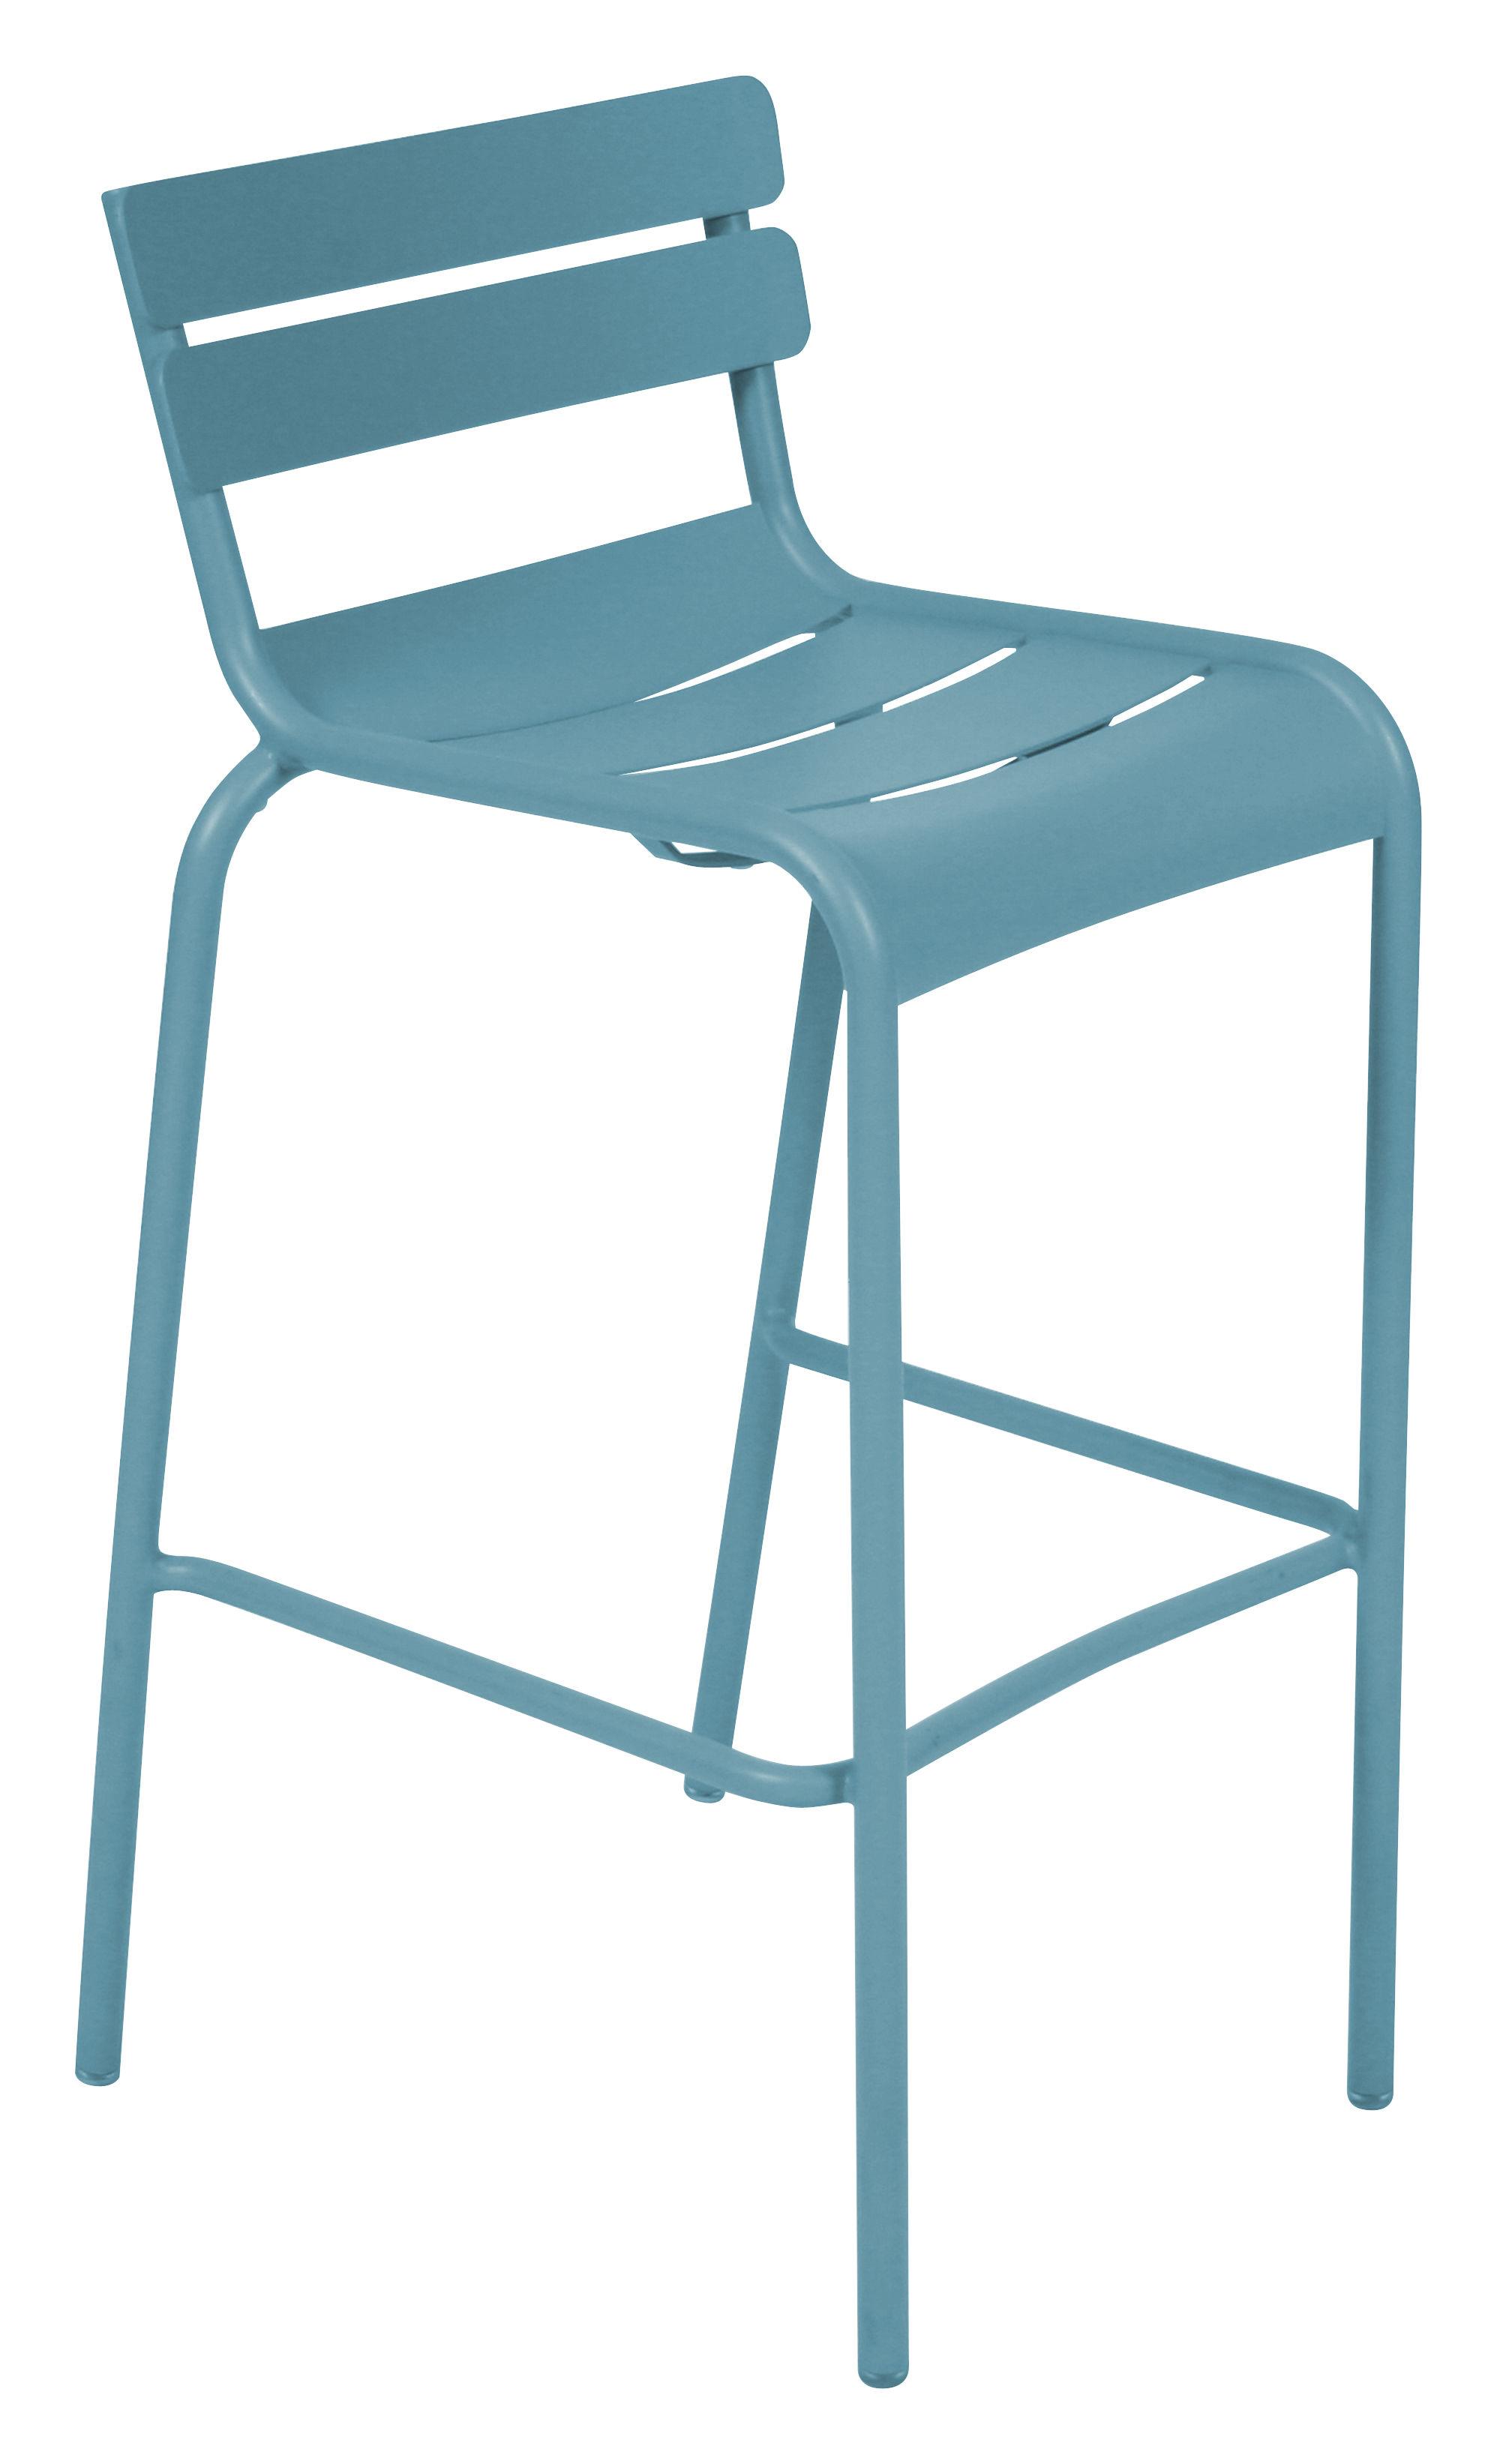 luxembourg sitzh he 80 cm fermob barhocker. Black Bedroom Furniture Sets. Home Design Ideas